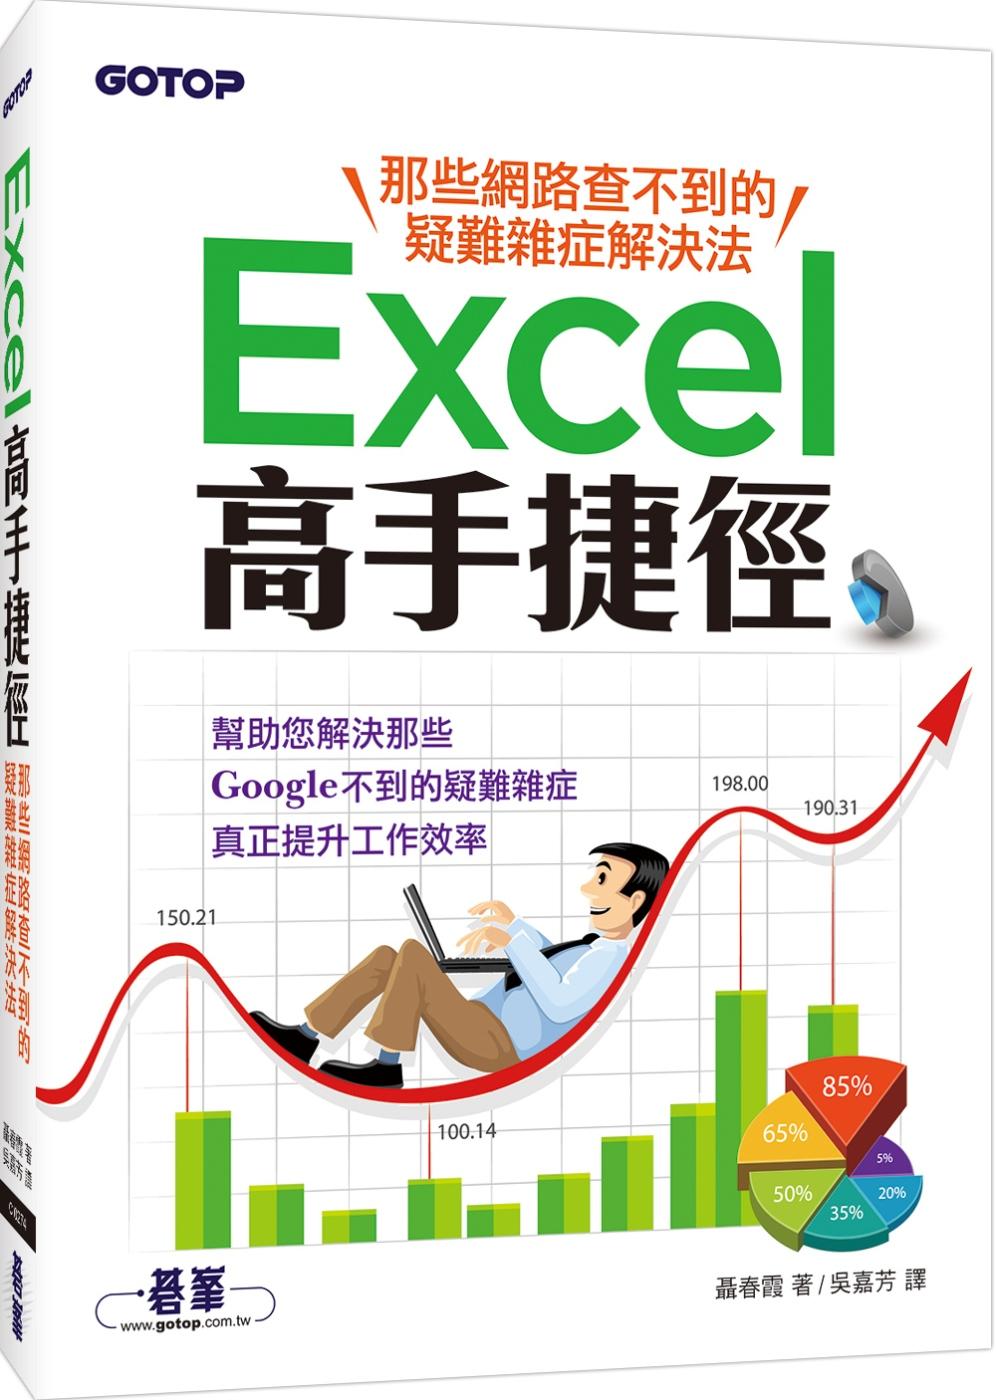 Excel高手捷徑:那些網路查不到的疑難雜症解決法